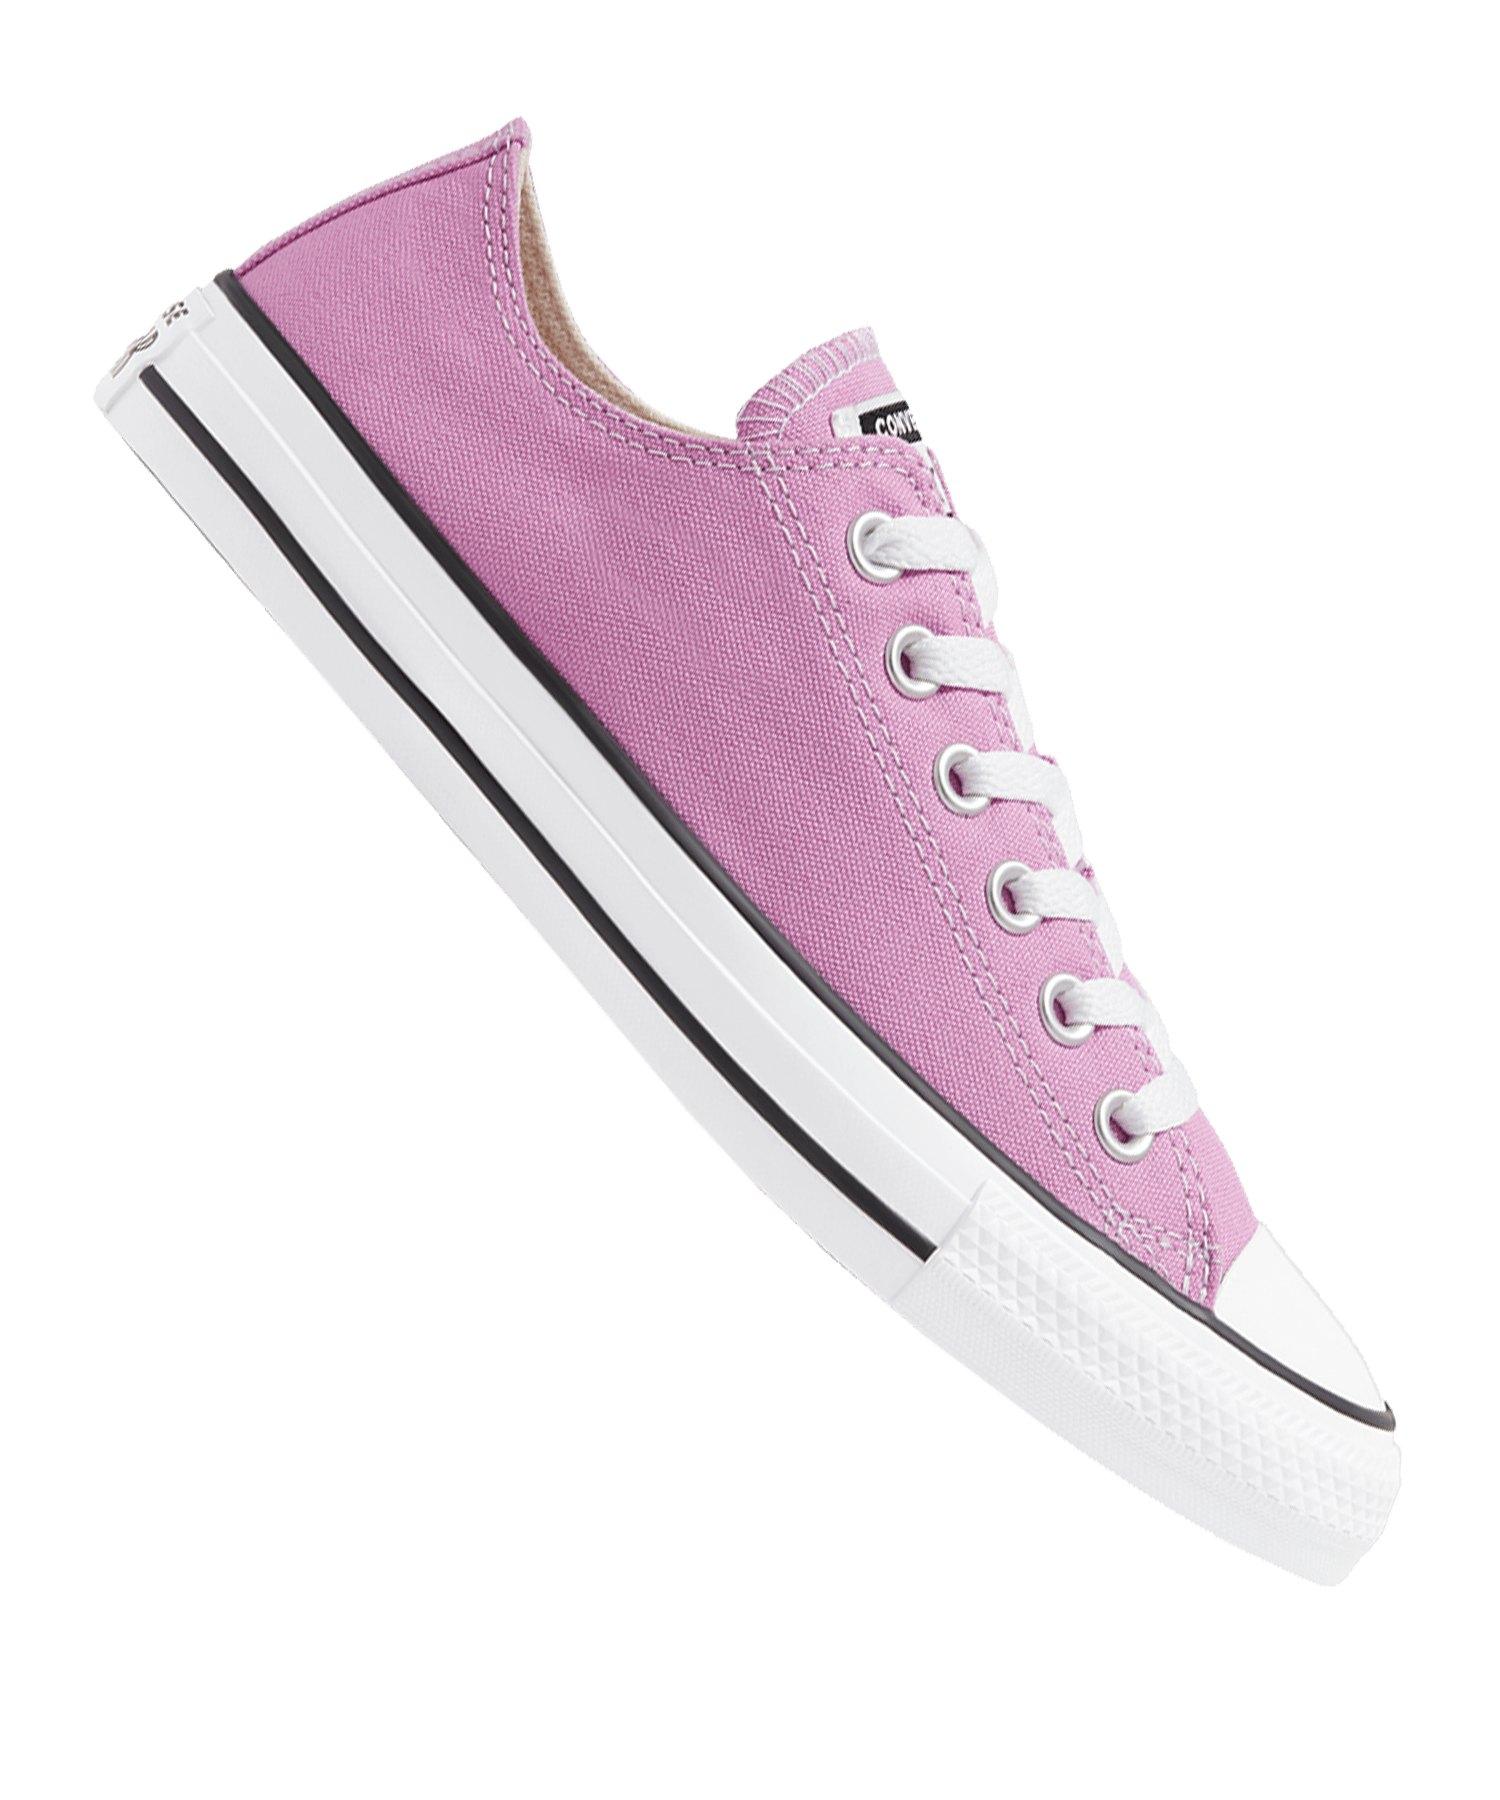 Converse Chuck Taylor AS Low Sneaker Damen Pink - pink